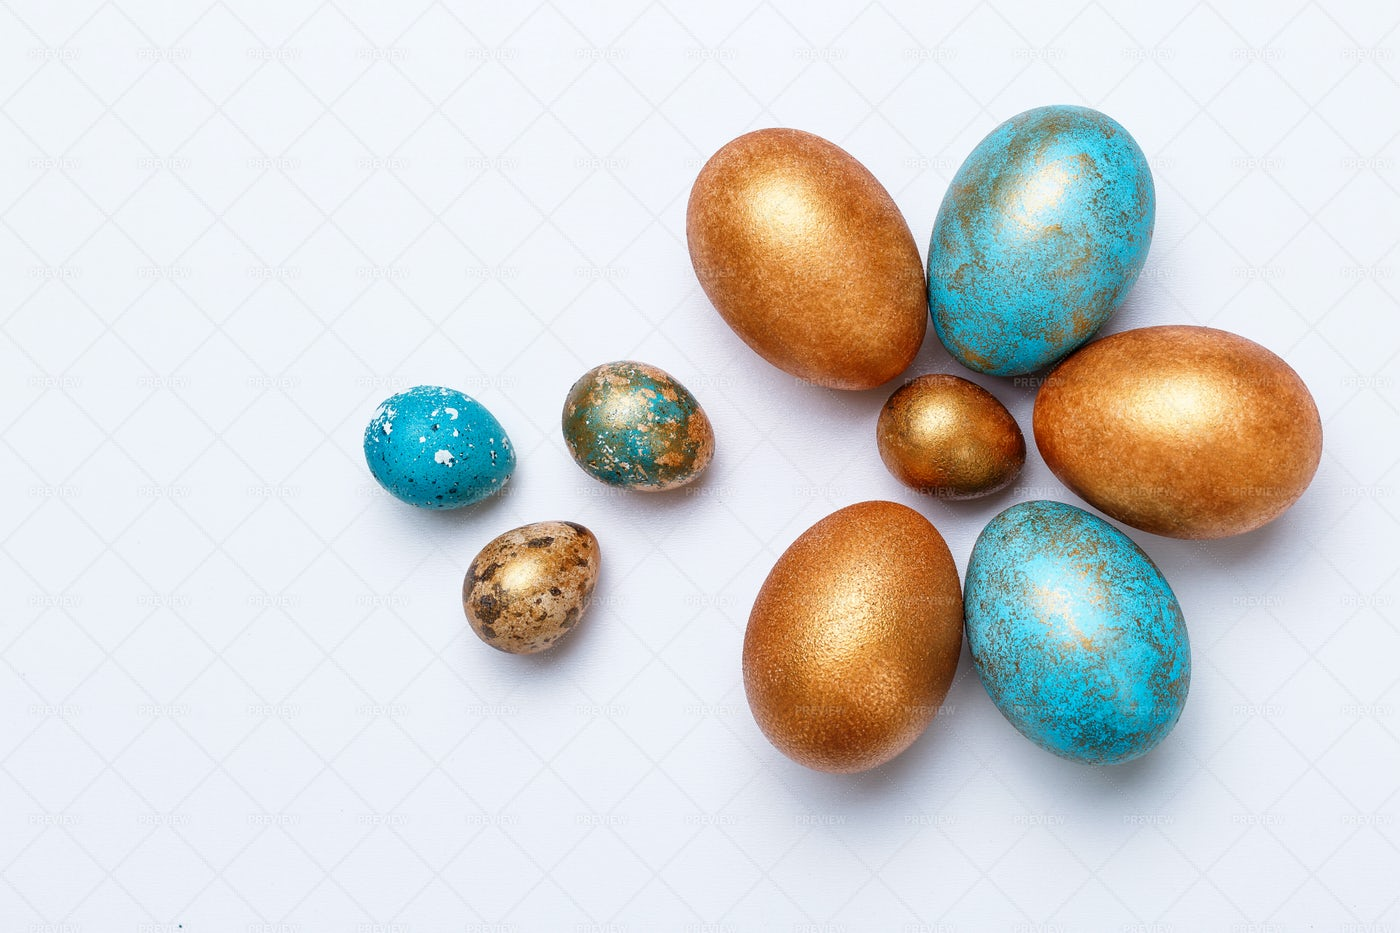 Designed Eastern Eggs: Stock Photos